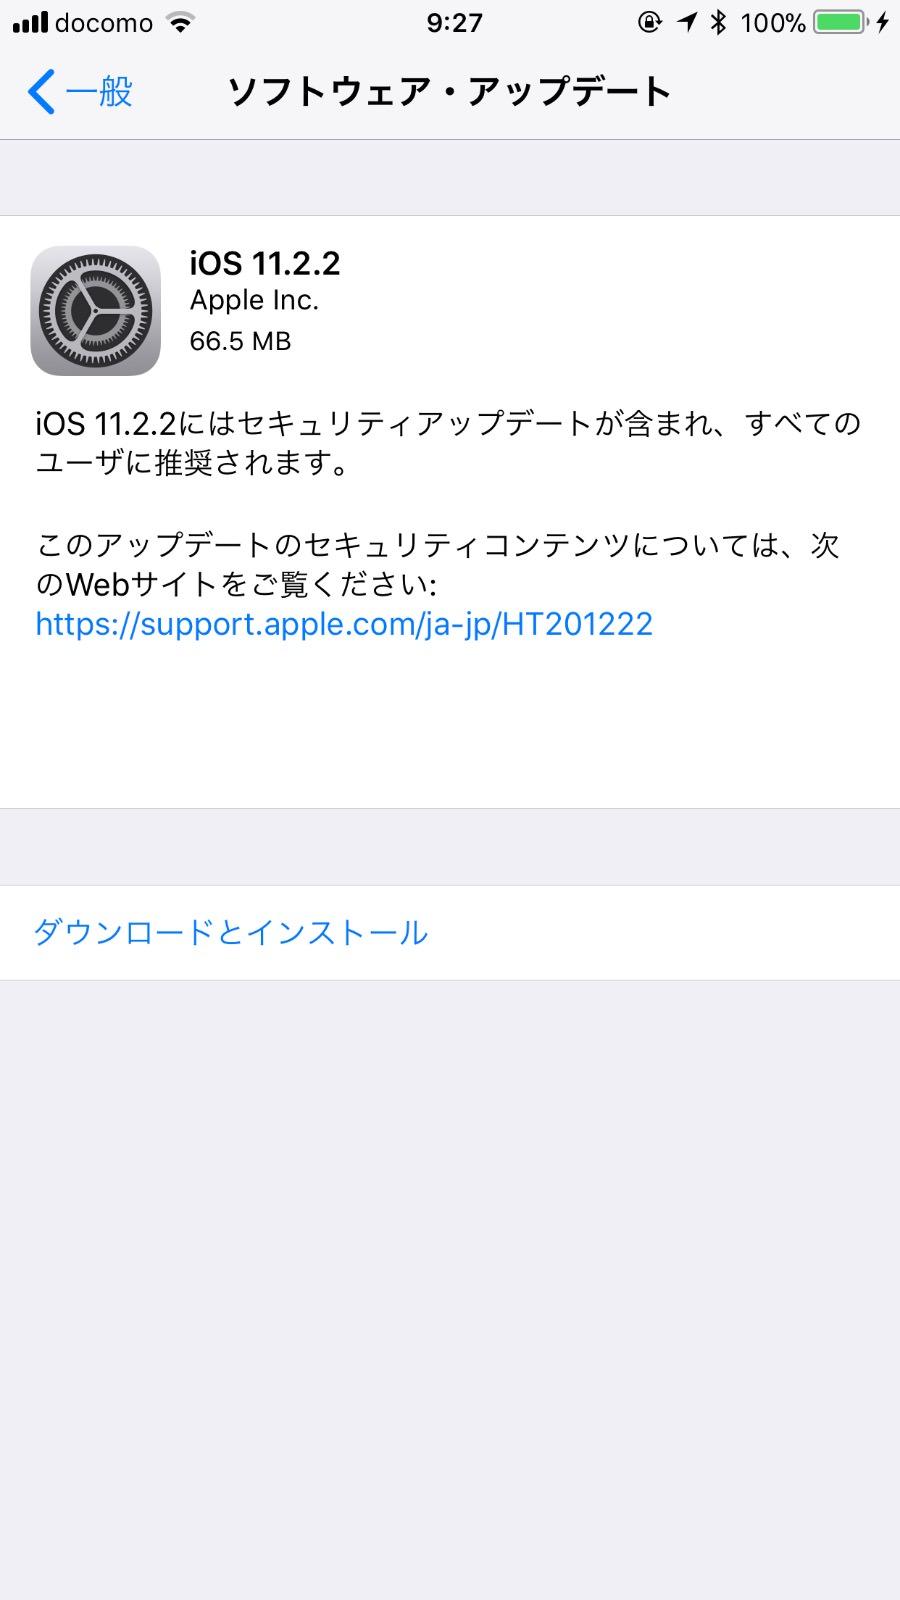 「iOS 11.2.2 ソフトウェアアップデート」リリース